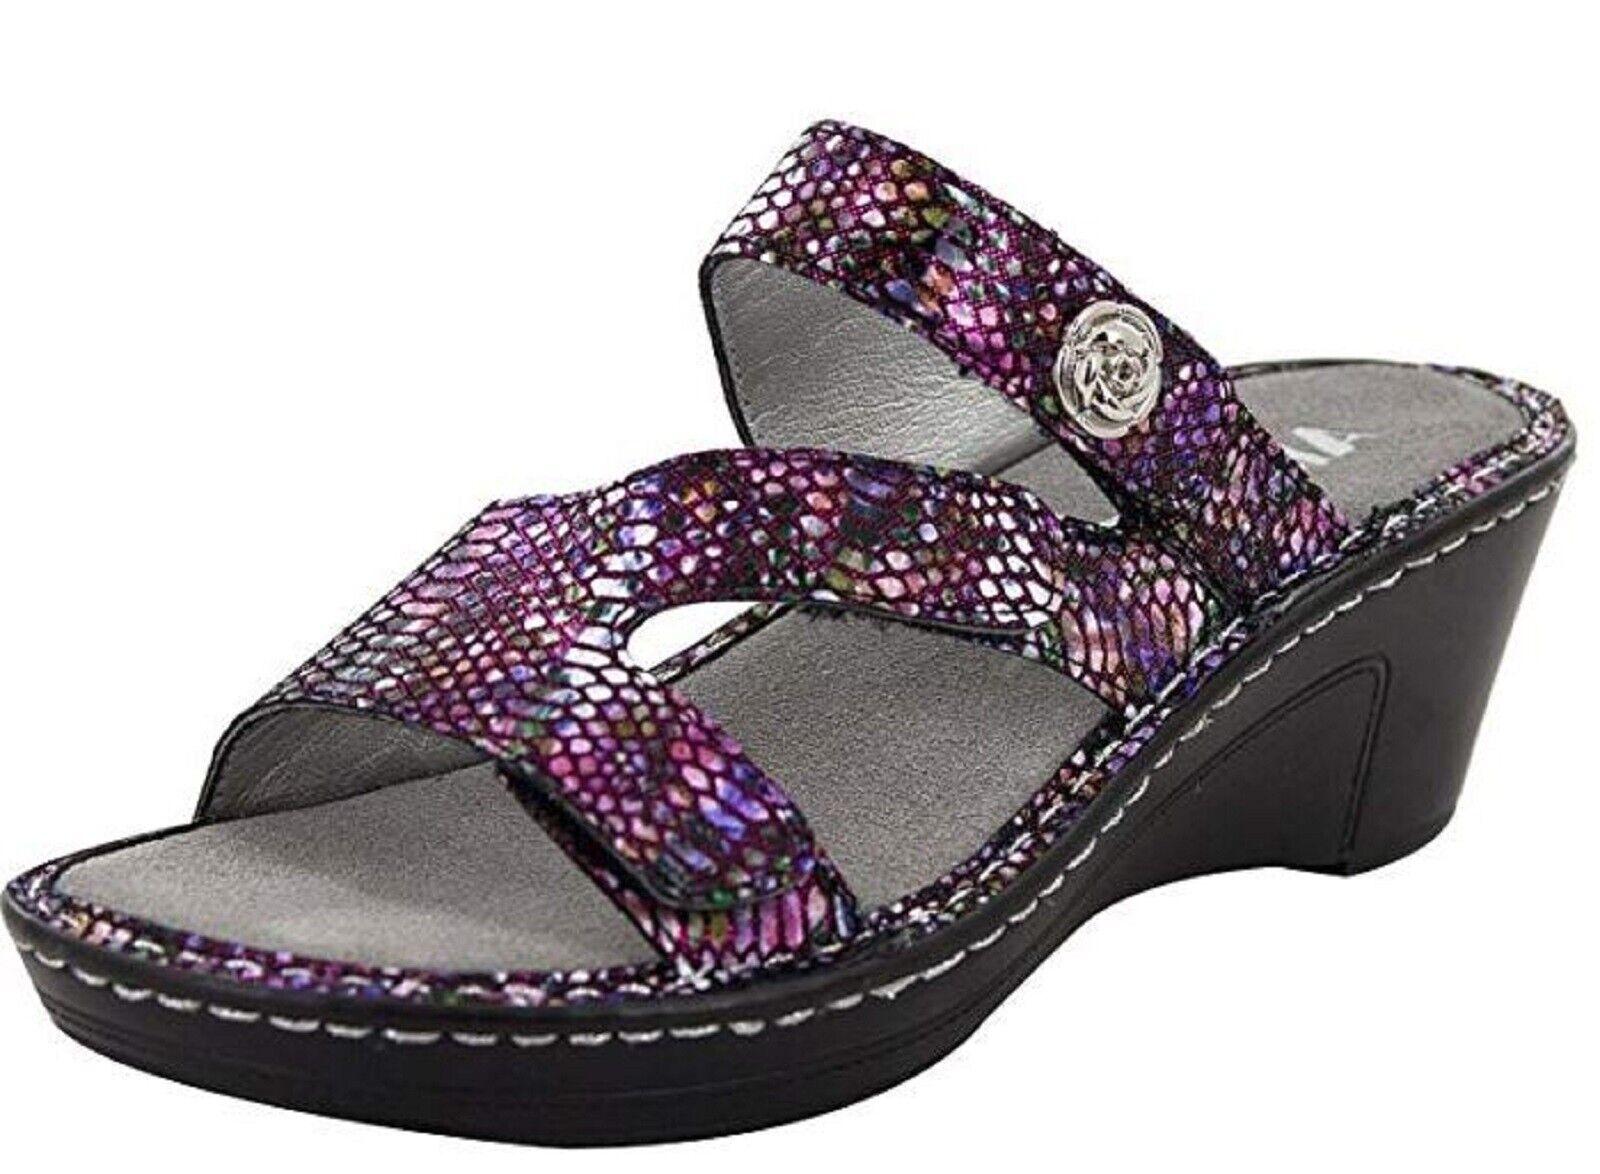 Alegria Womens LOTI Leather Wedge Sandals FUNTASTIC Size 8 -